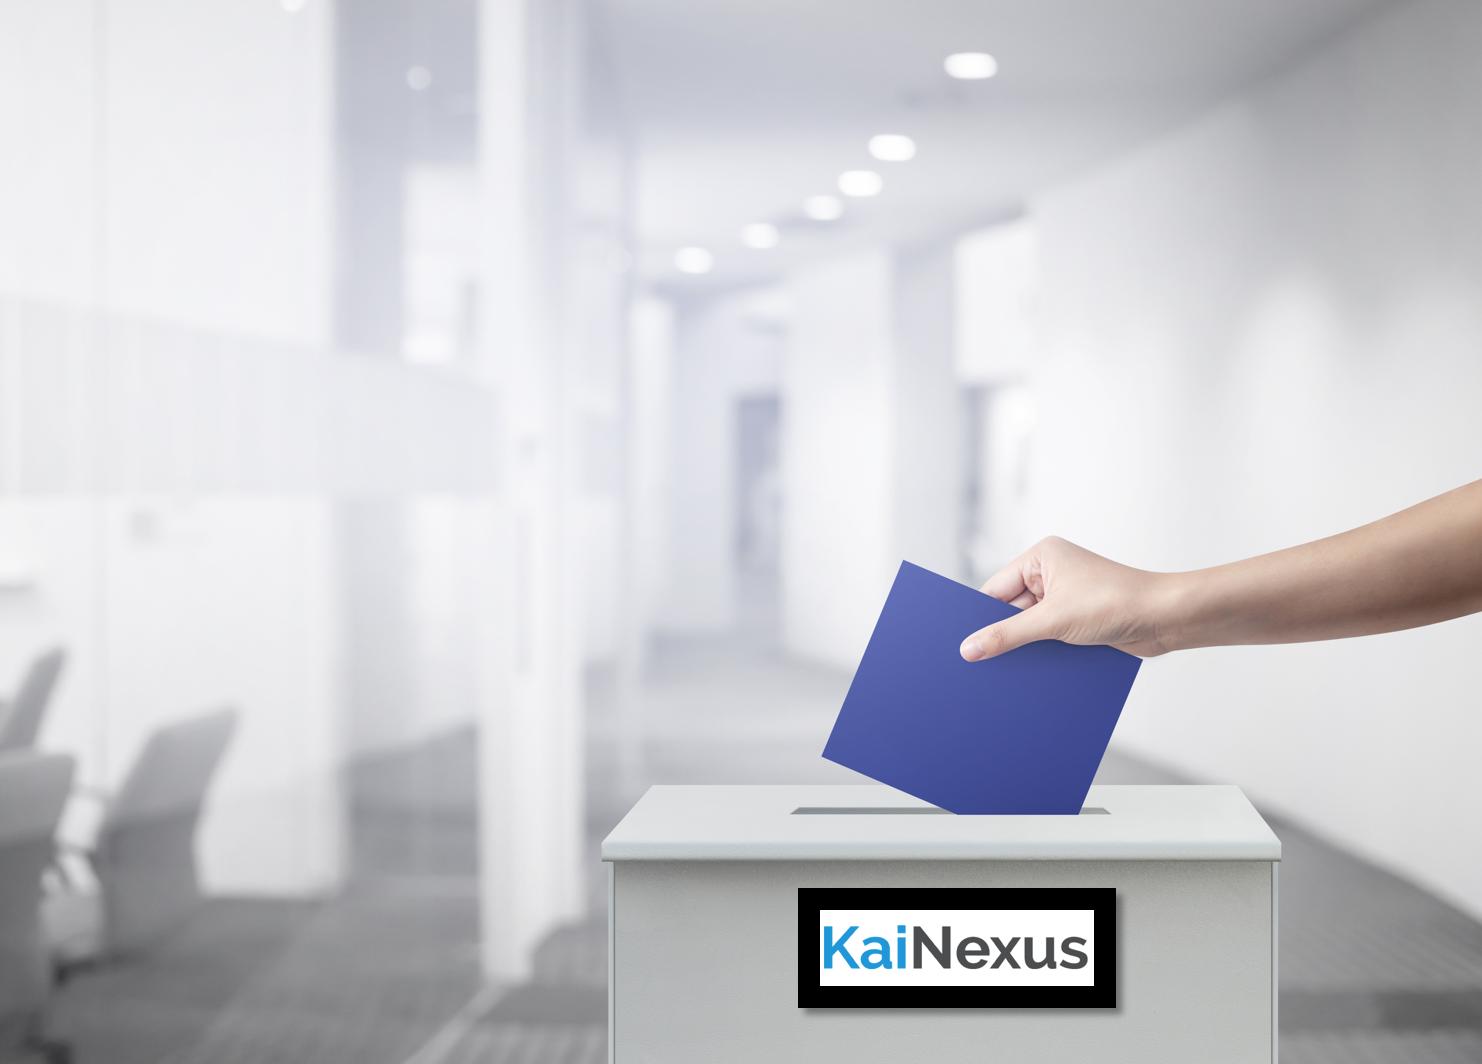 KaiNexus Suggestion Box